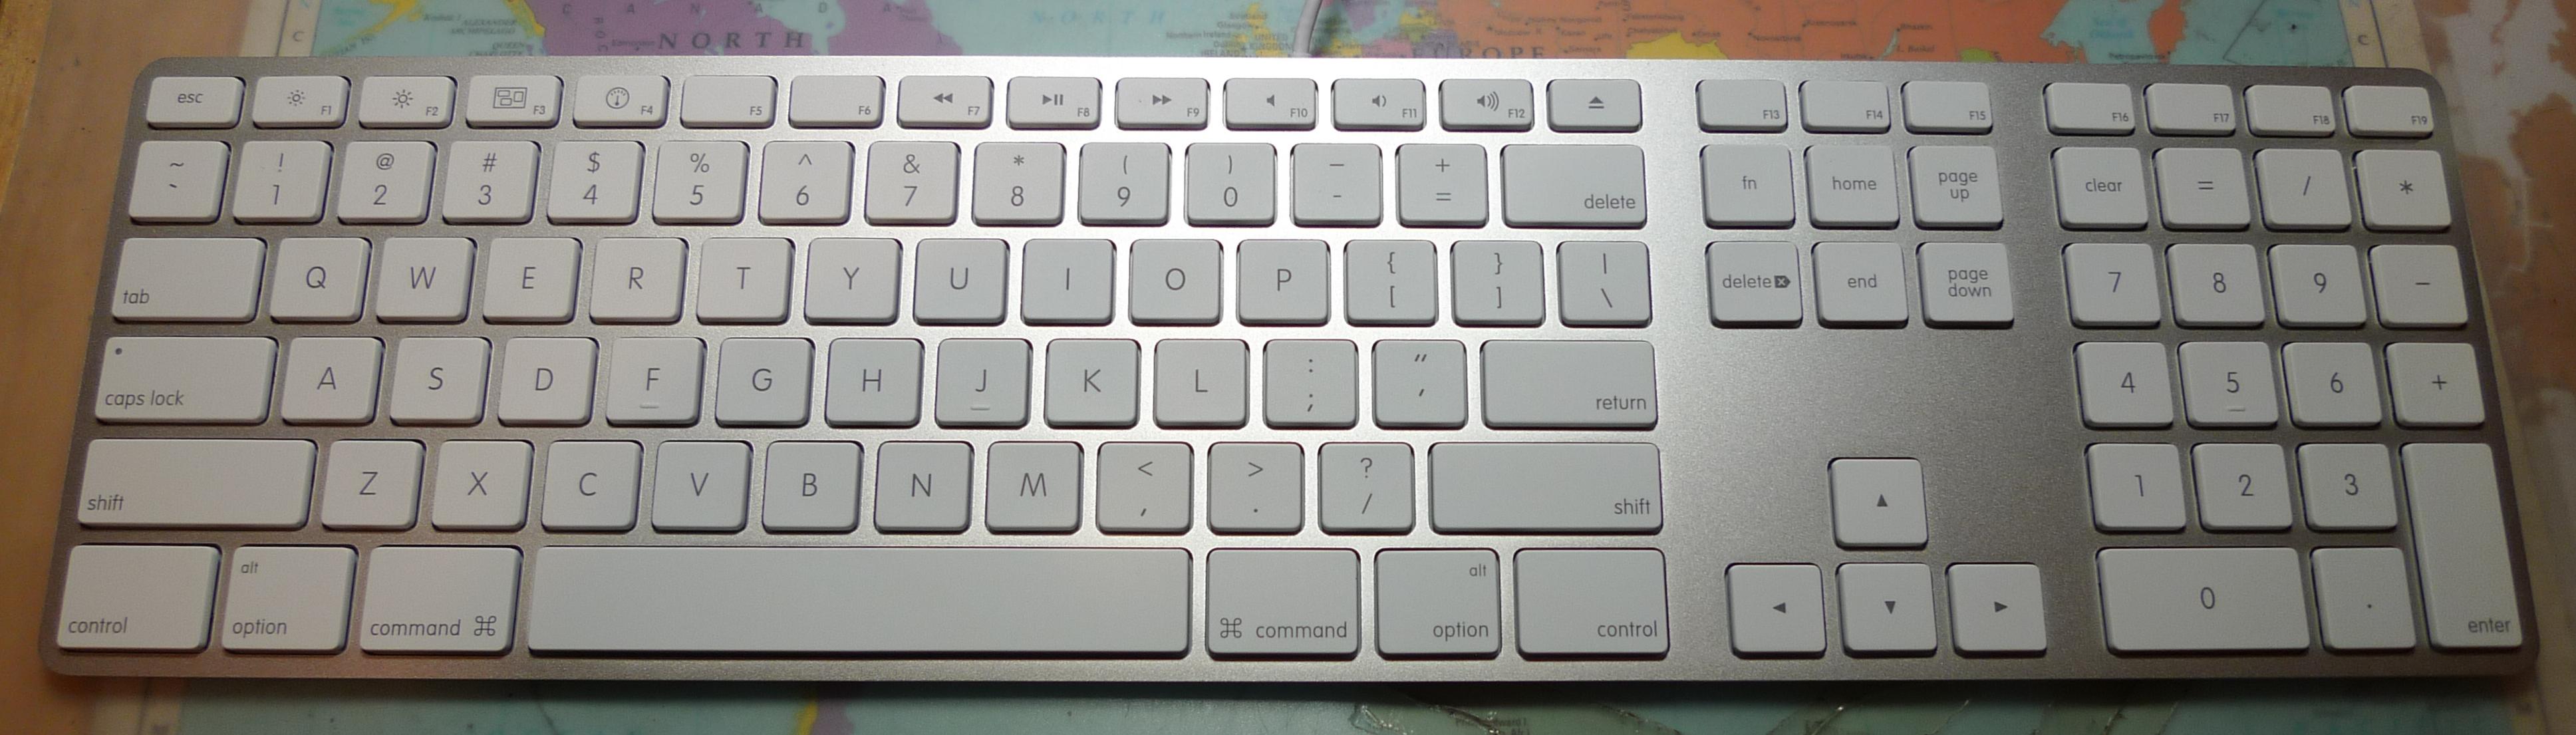 imac laptop keyboard - photo #12